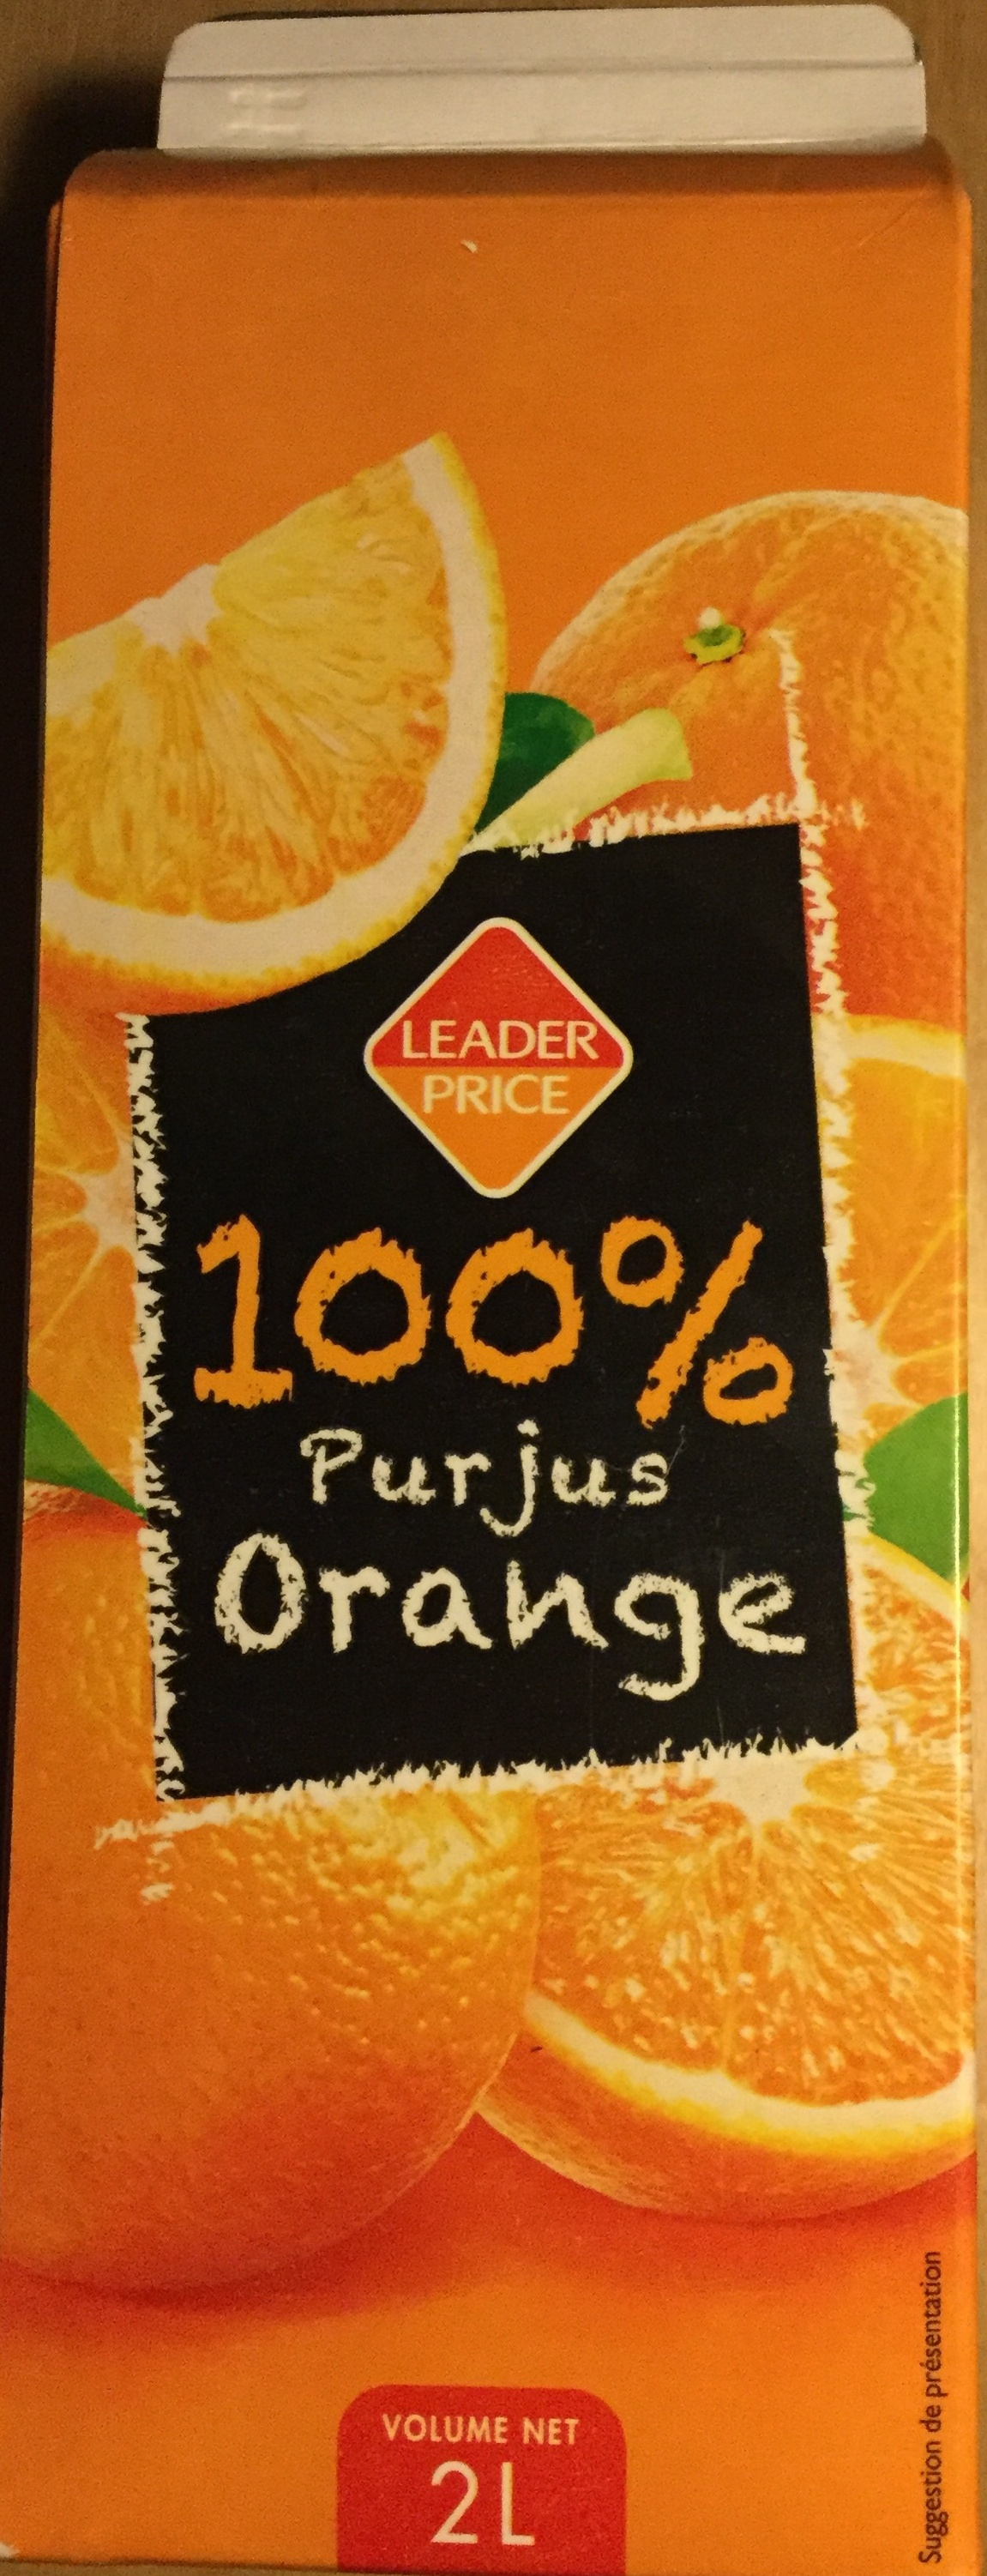 100 % Pur jus Orange - Produit - fr